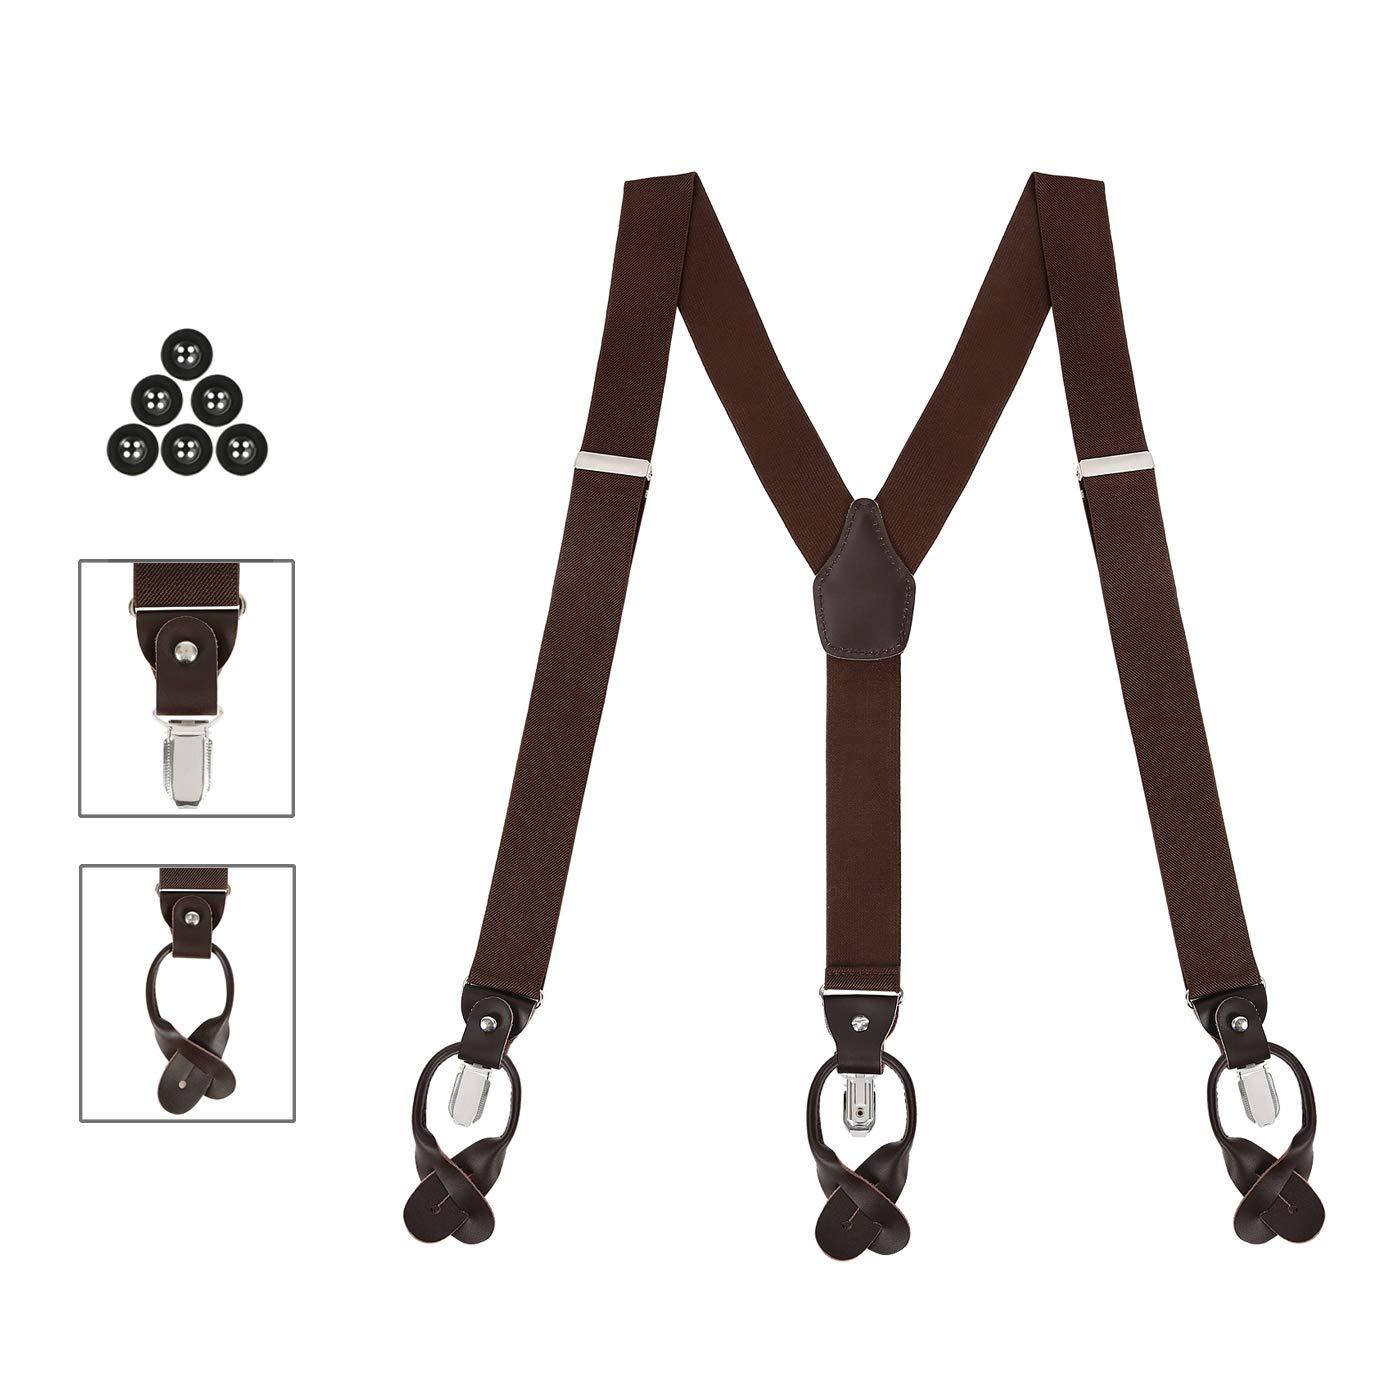 HDE Convertible Suspenders for Men Button End Clip Adjustable Shoulder Straps HDE-54023